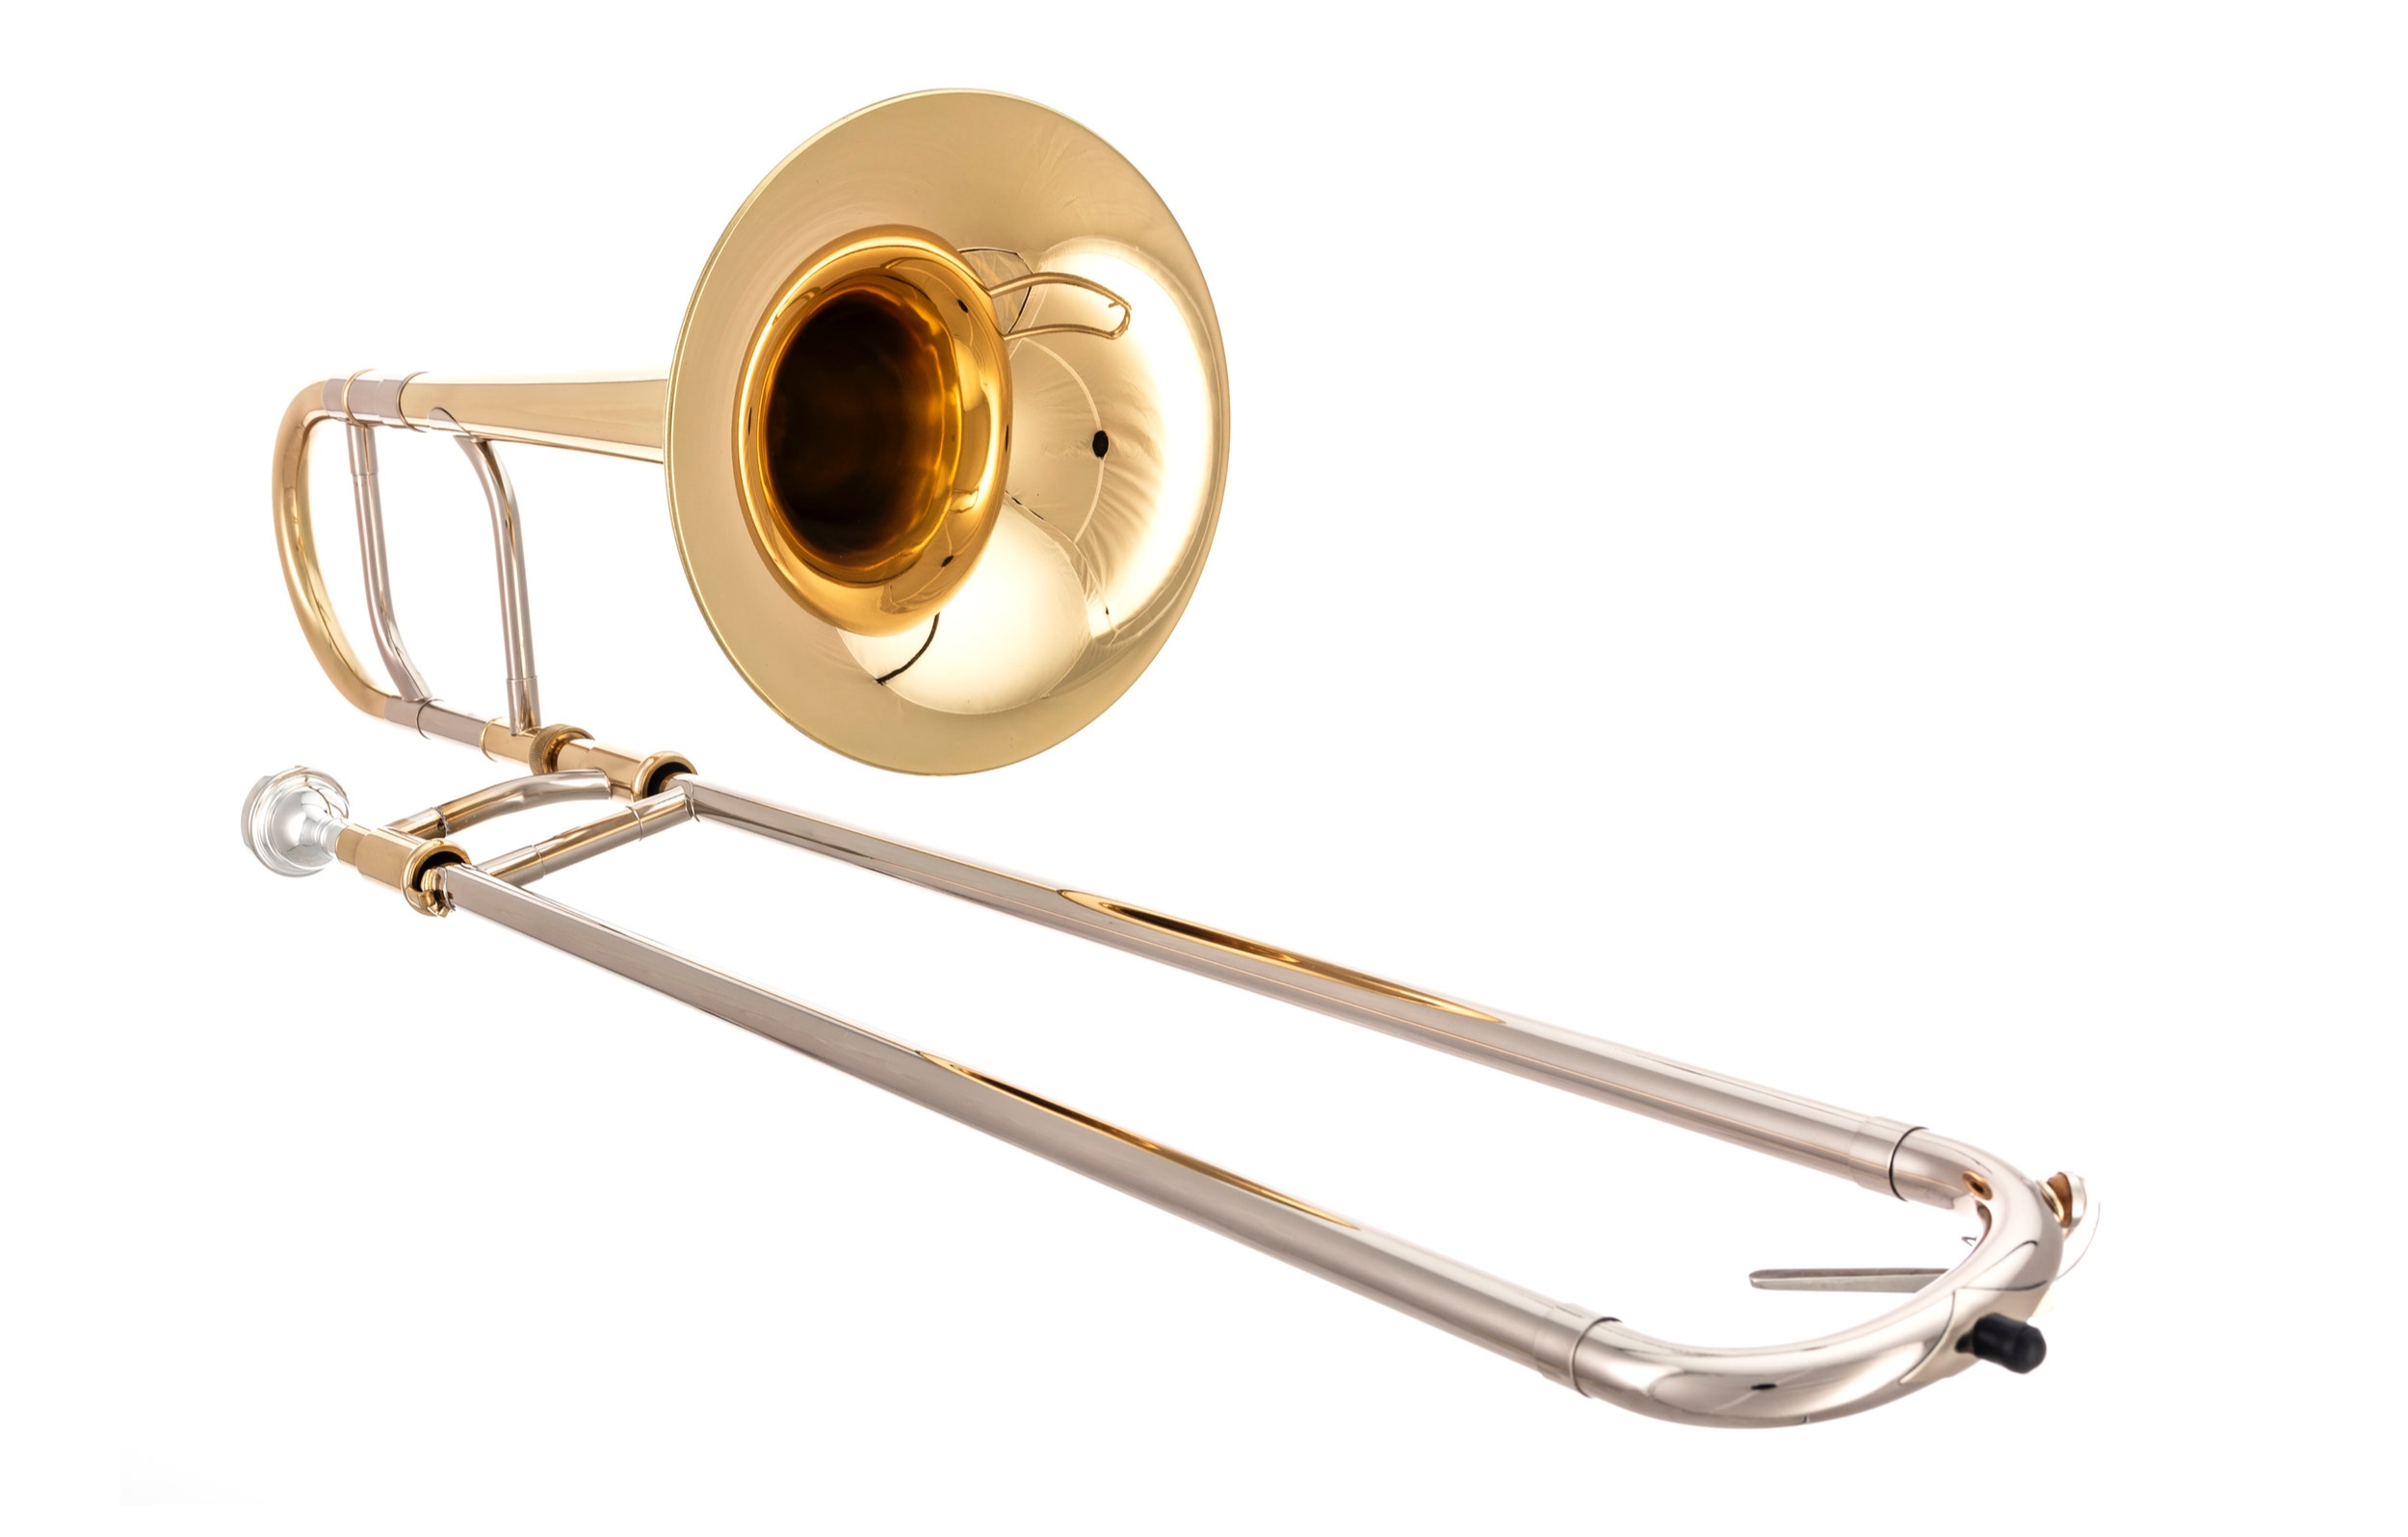 ALTO+Trombone+TBA710+001.jpg